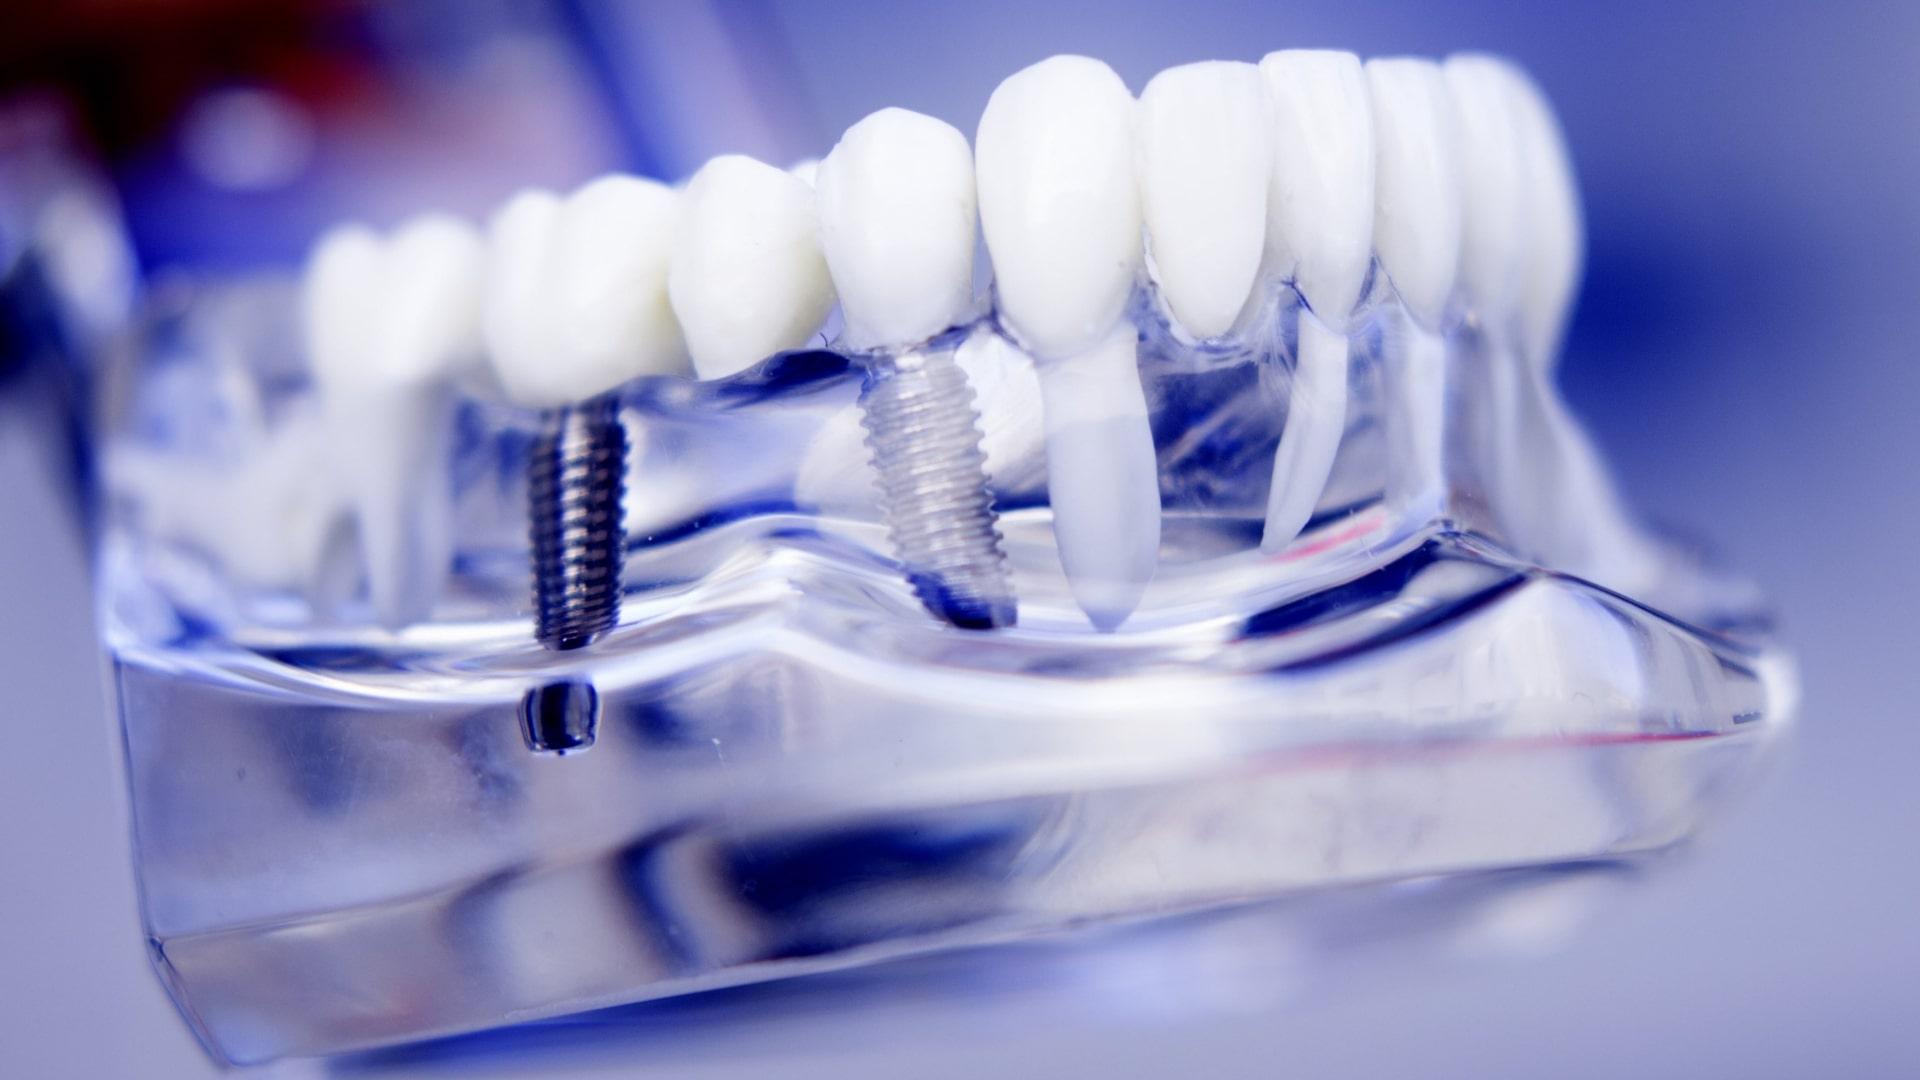 Базальная имплантация зубов в Киеве,  базальная имплантология цены в Украине